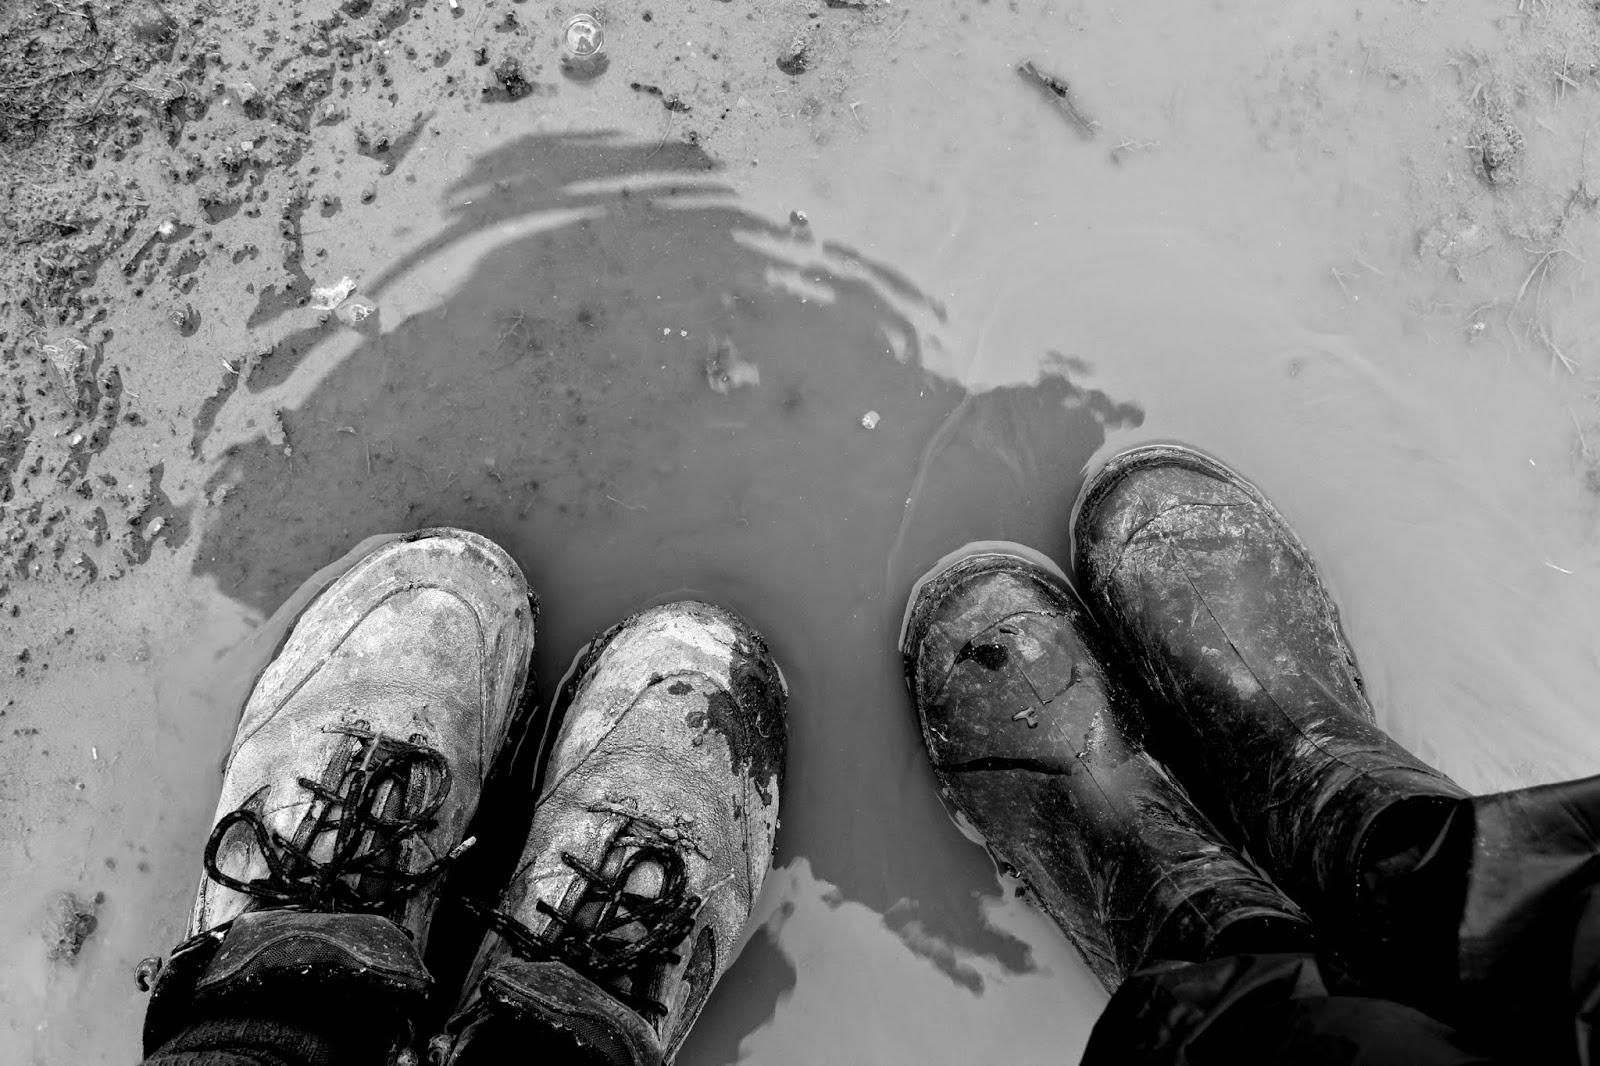 Muddy puddle // 76sunflowers